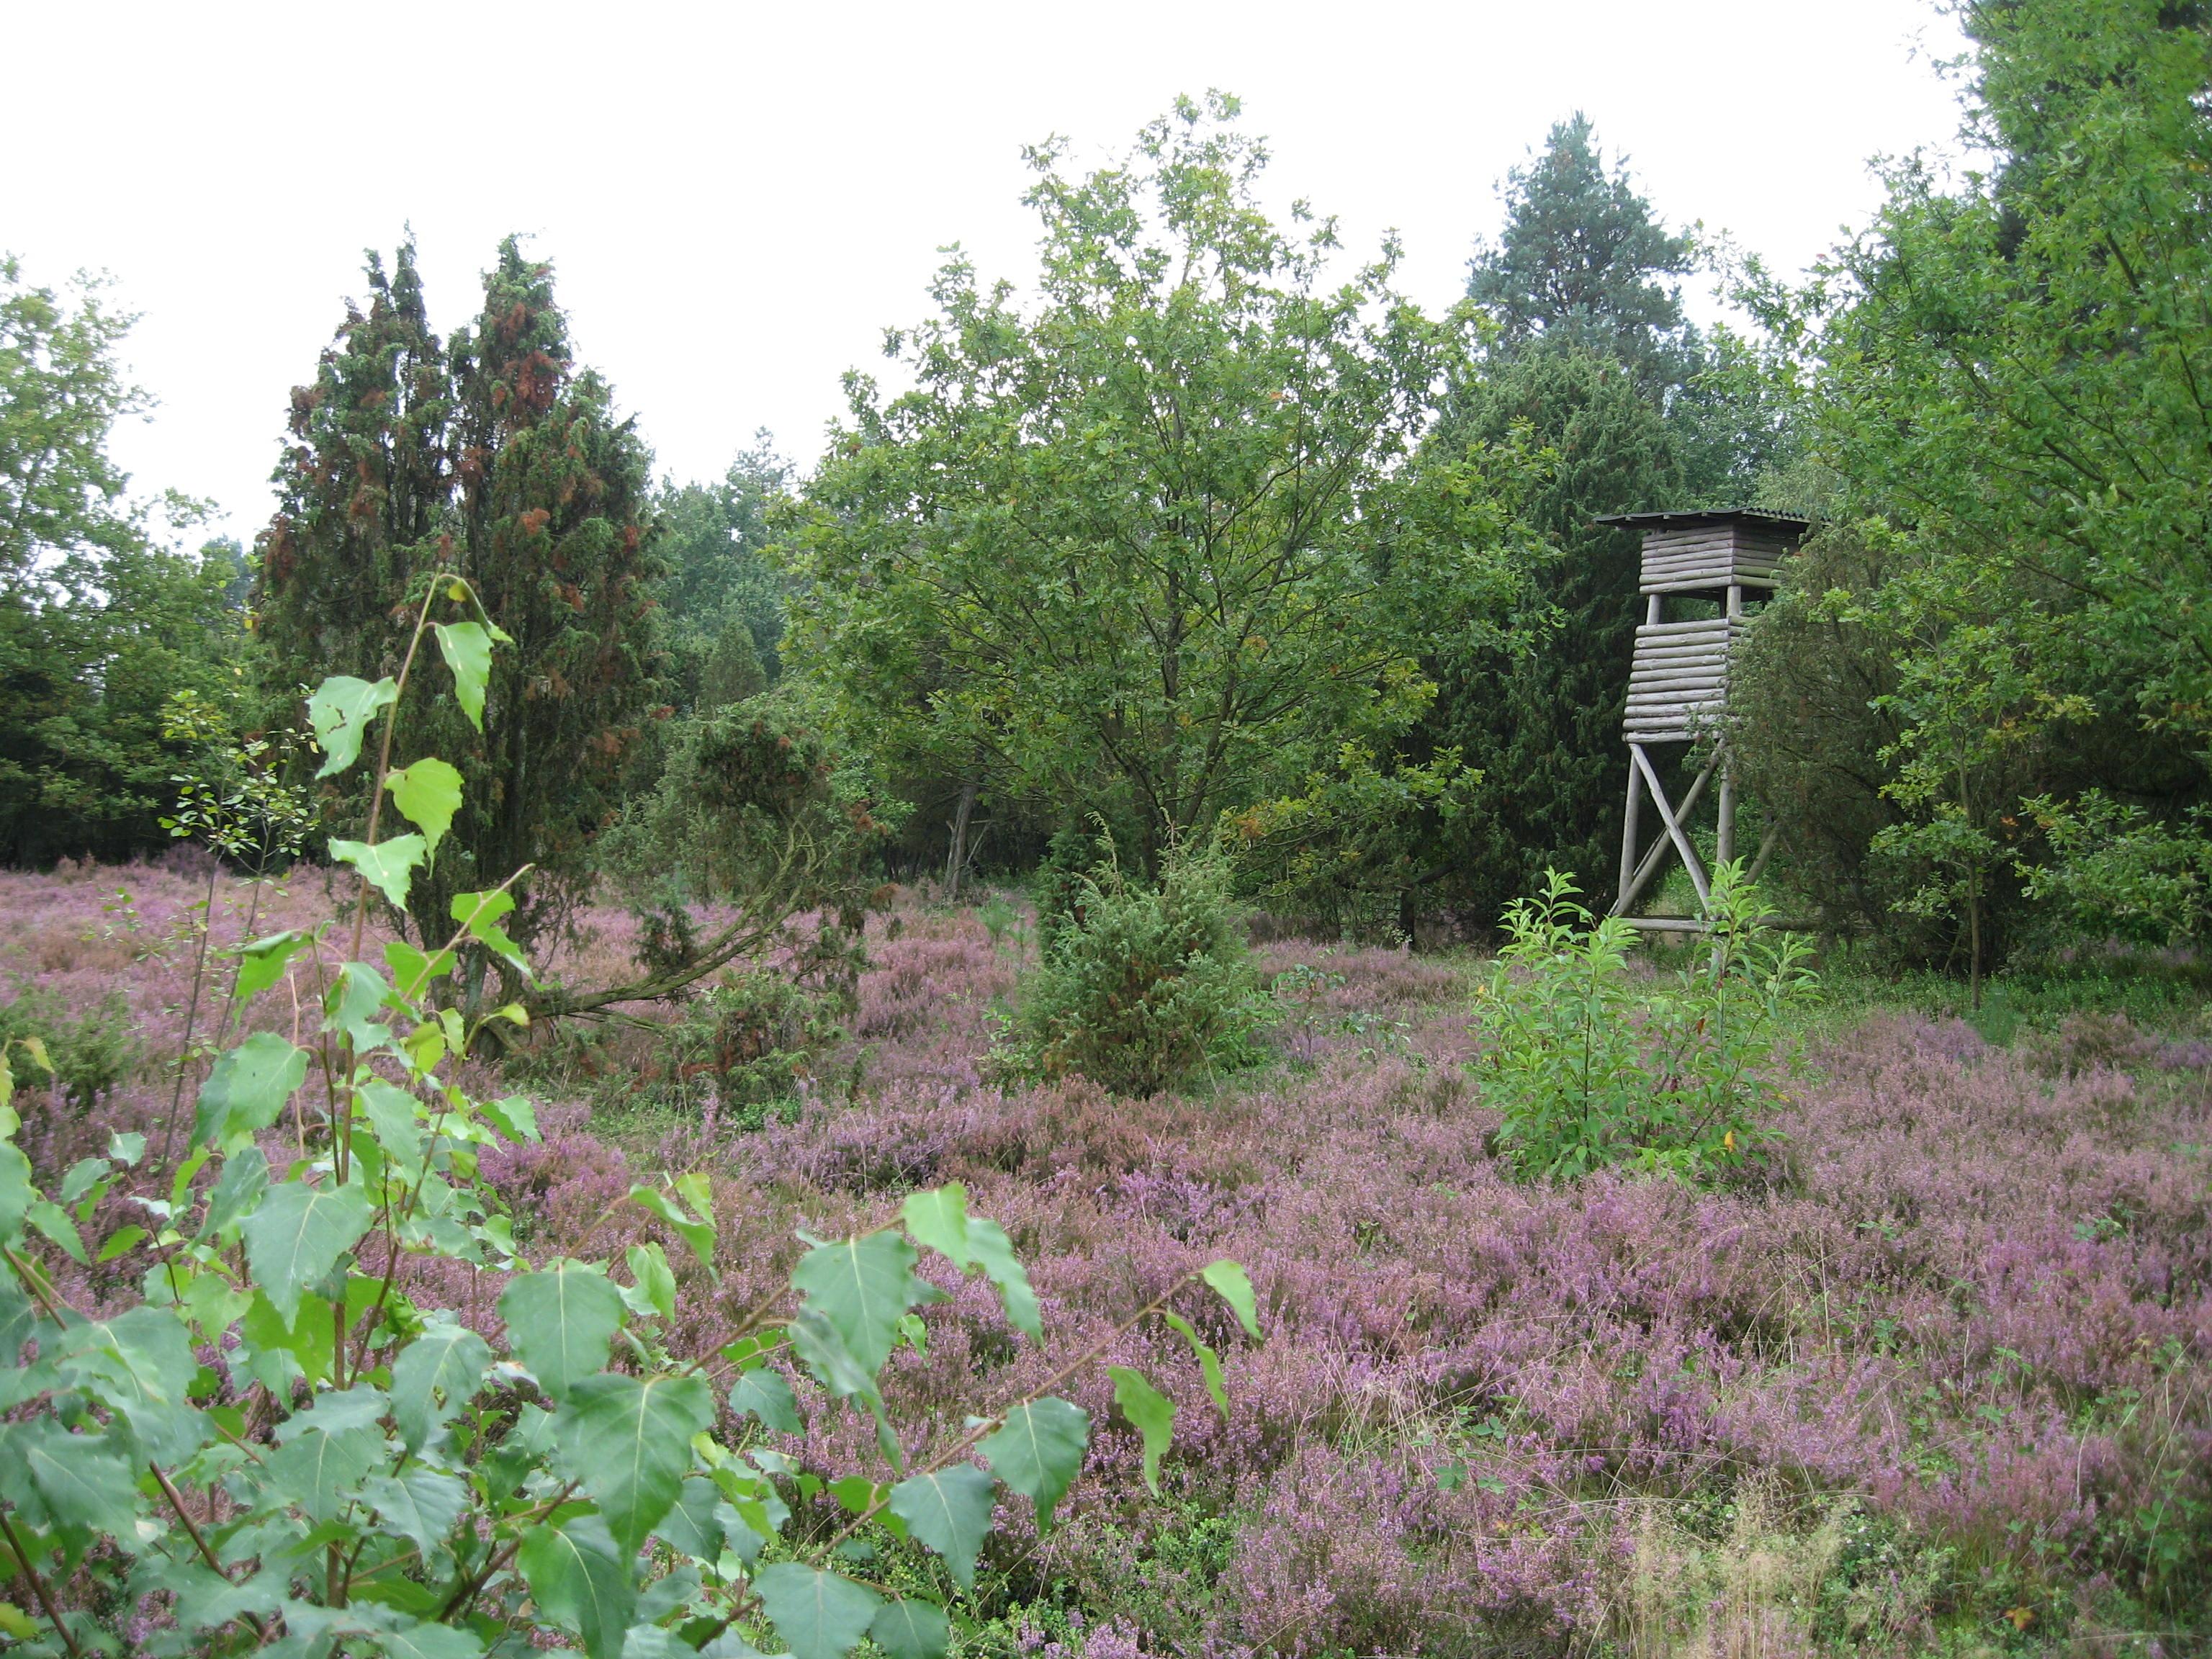 Photos: Lüneburger Heide 2014 (with bonus crazy house)   Cora Buhlert